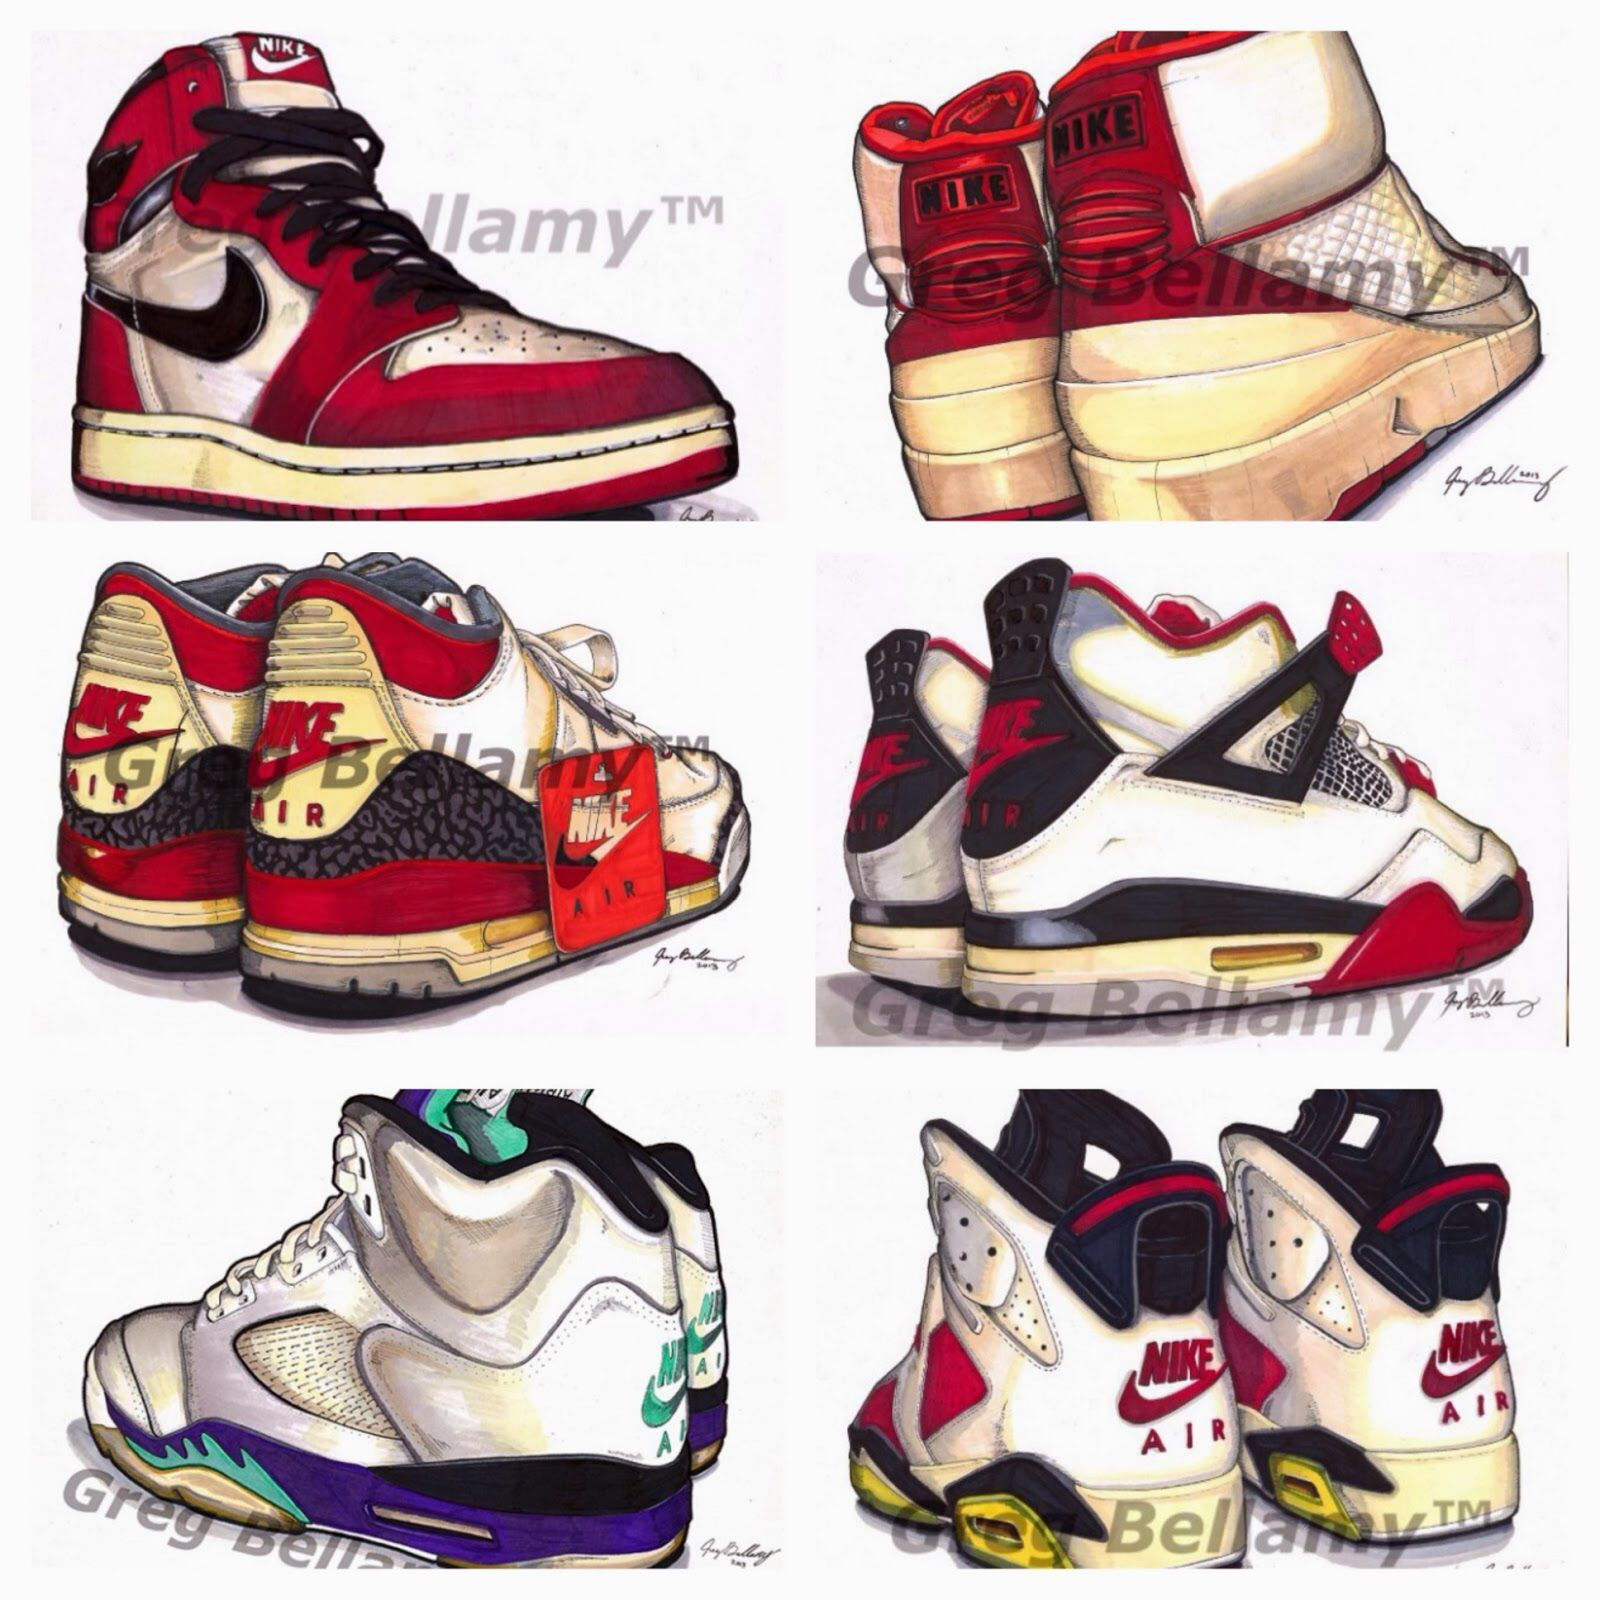 scarpe uomo nike jordan estive